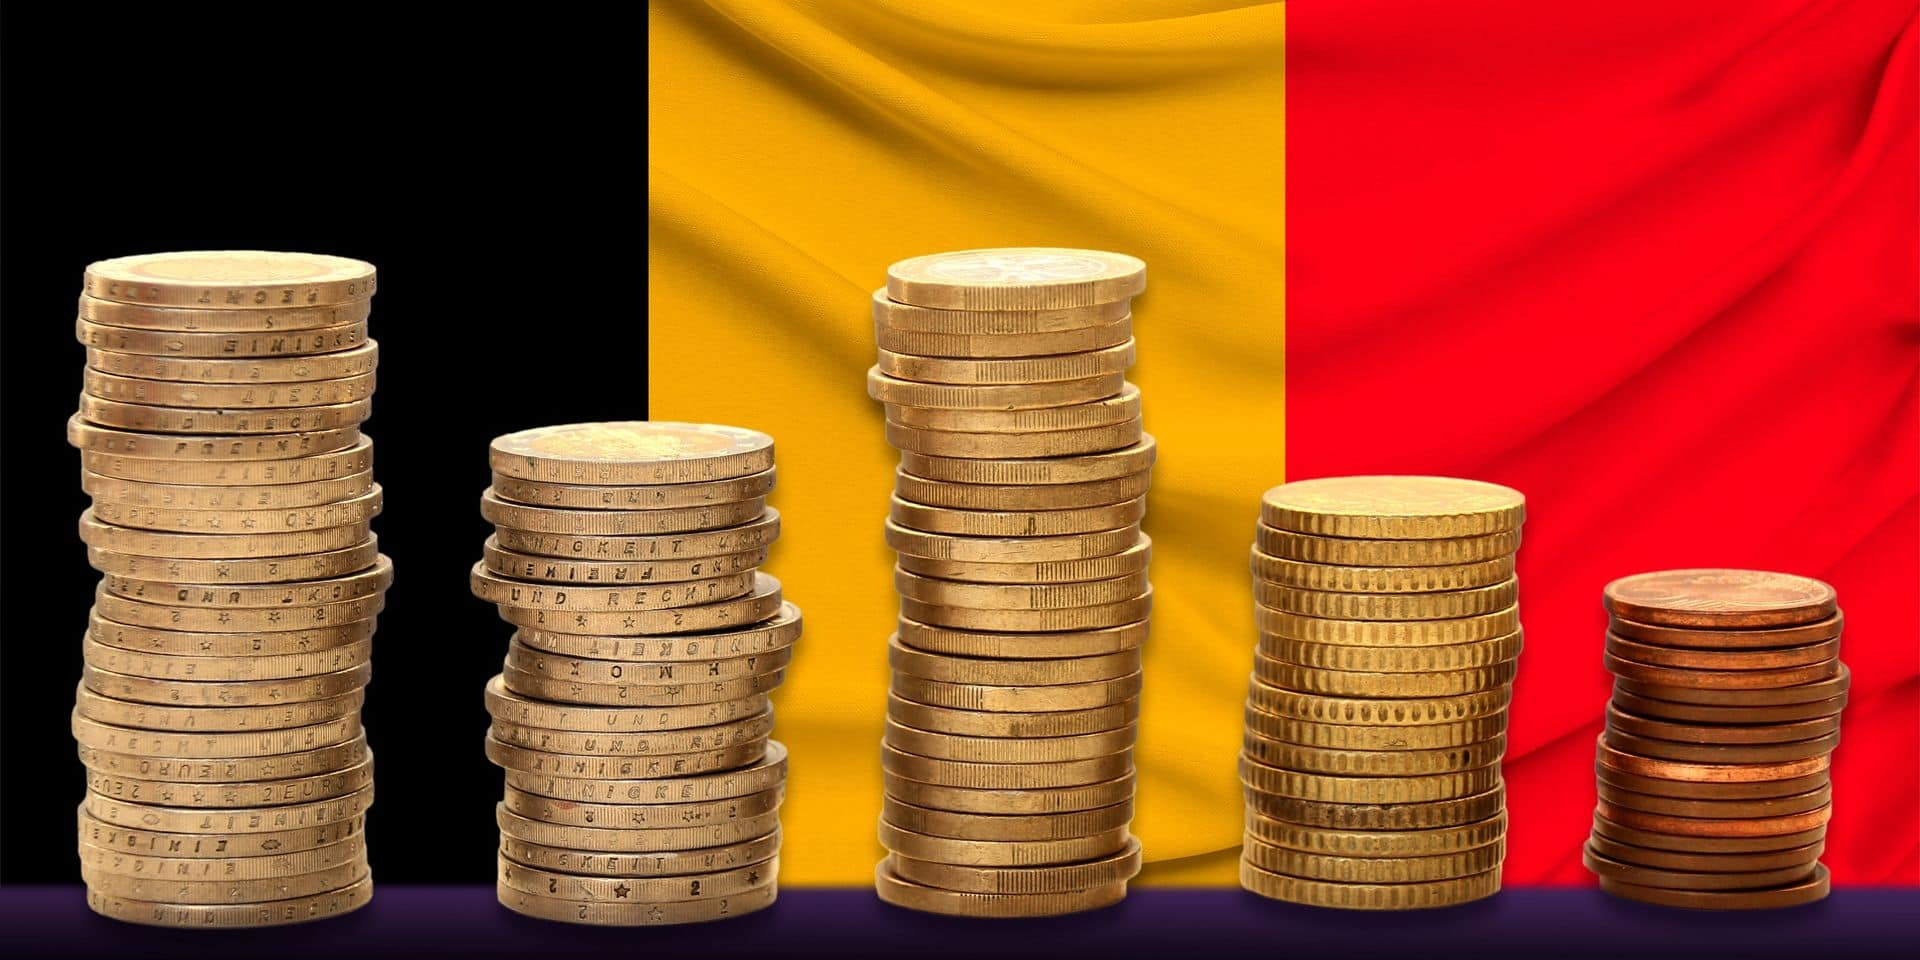 Le Belge gagne en moyenne 3 783 euros bruts par mois